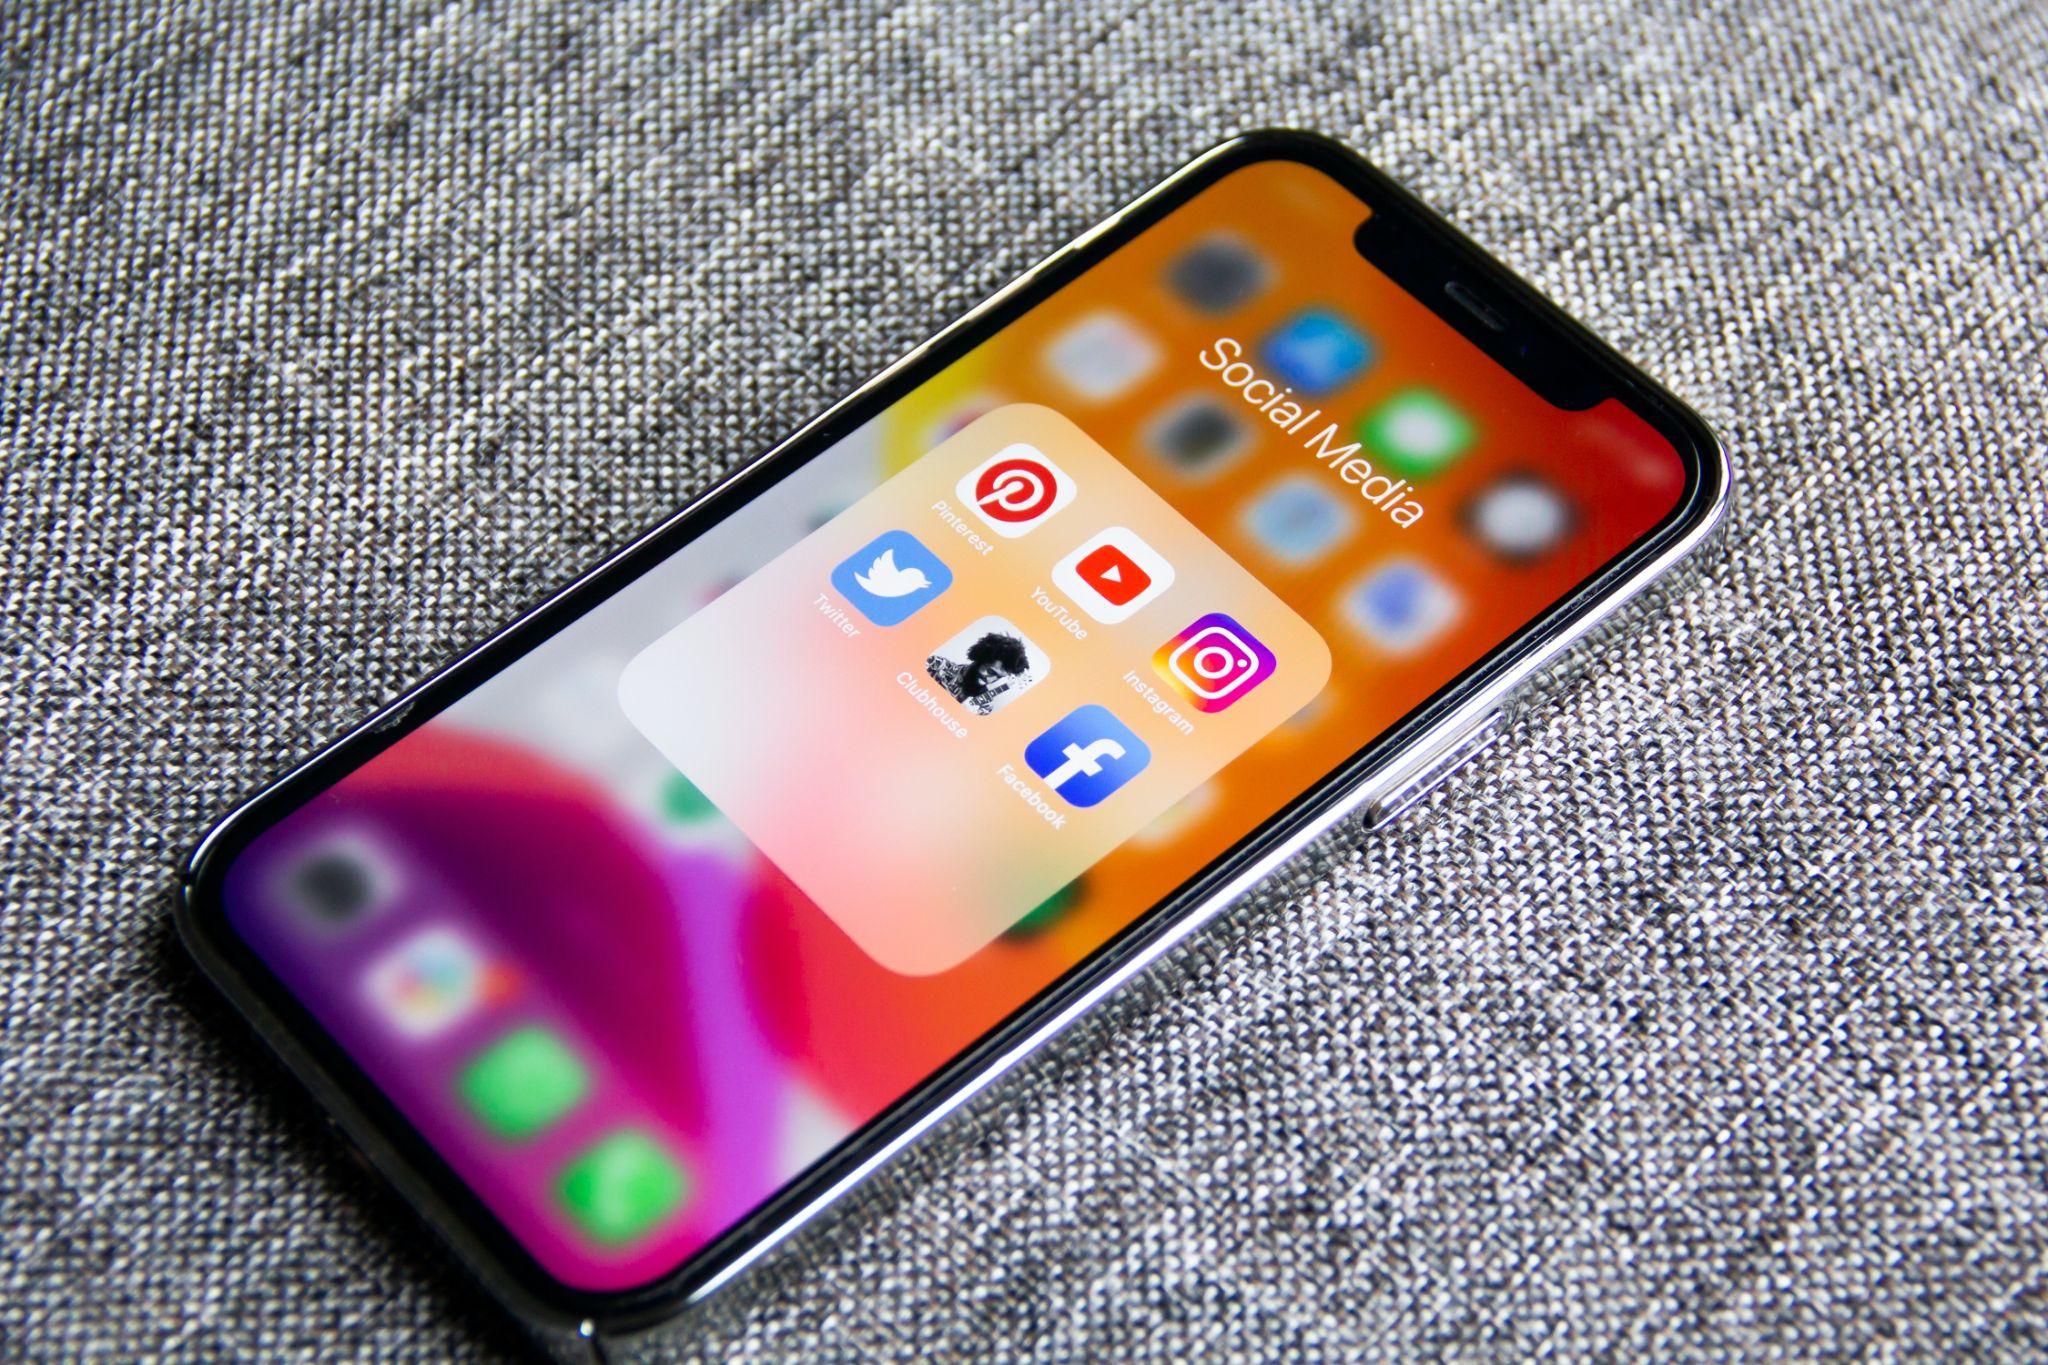 Social media apps on a cell phone